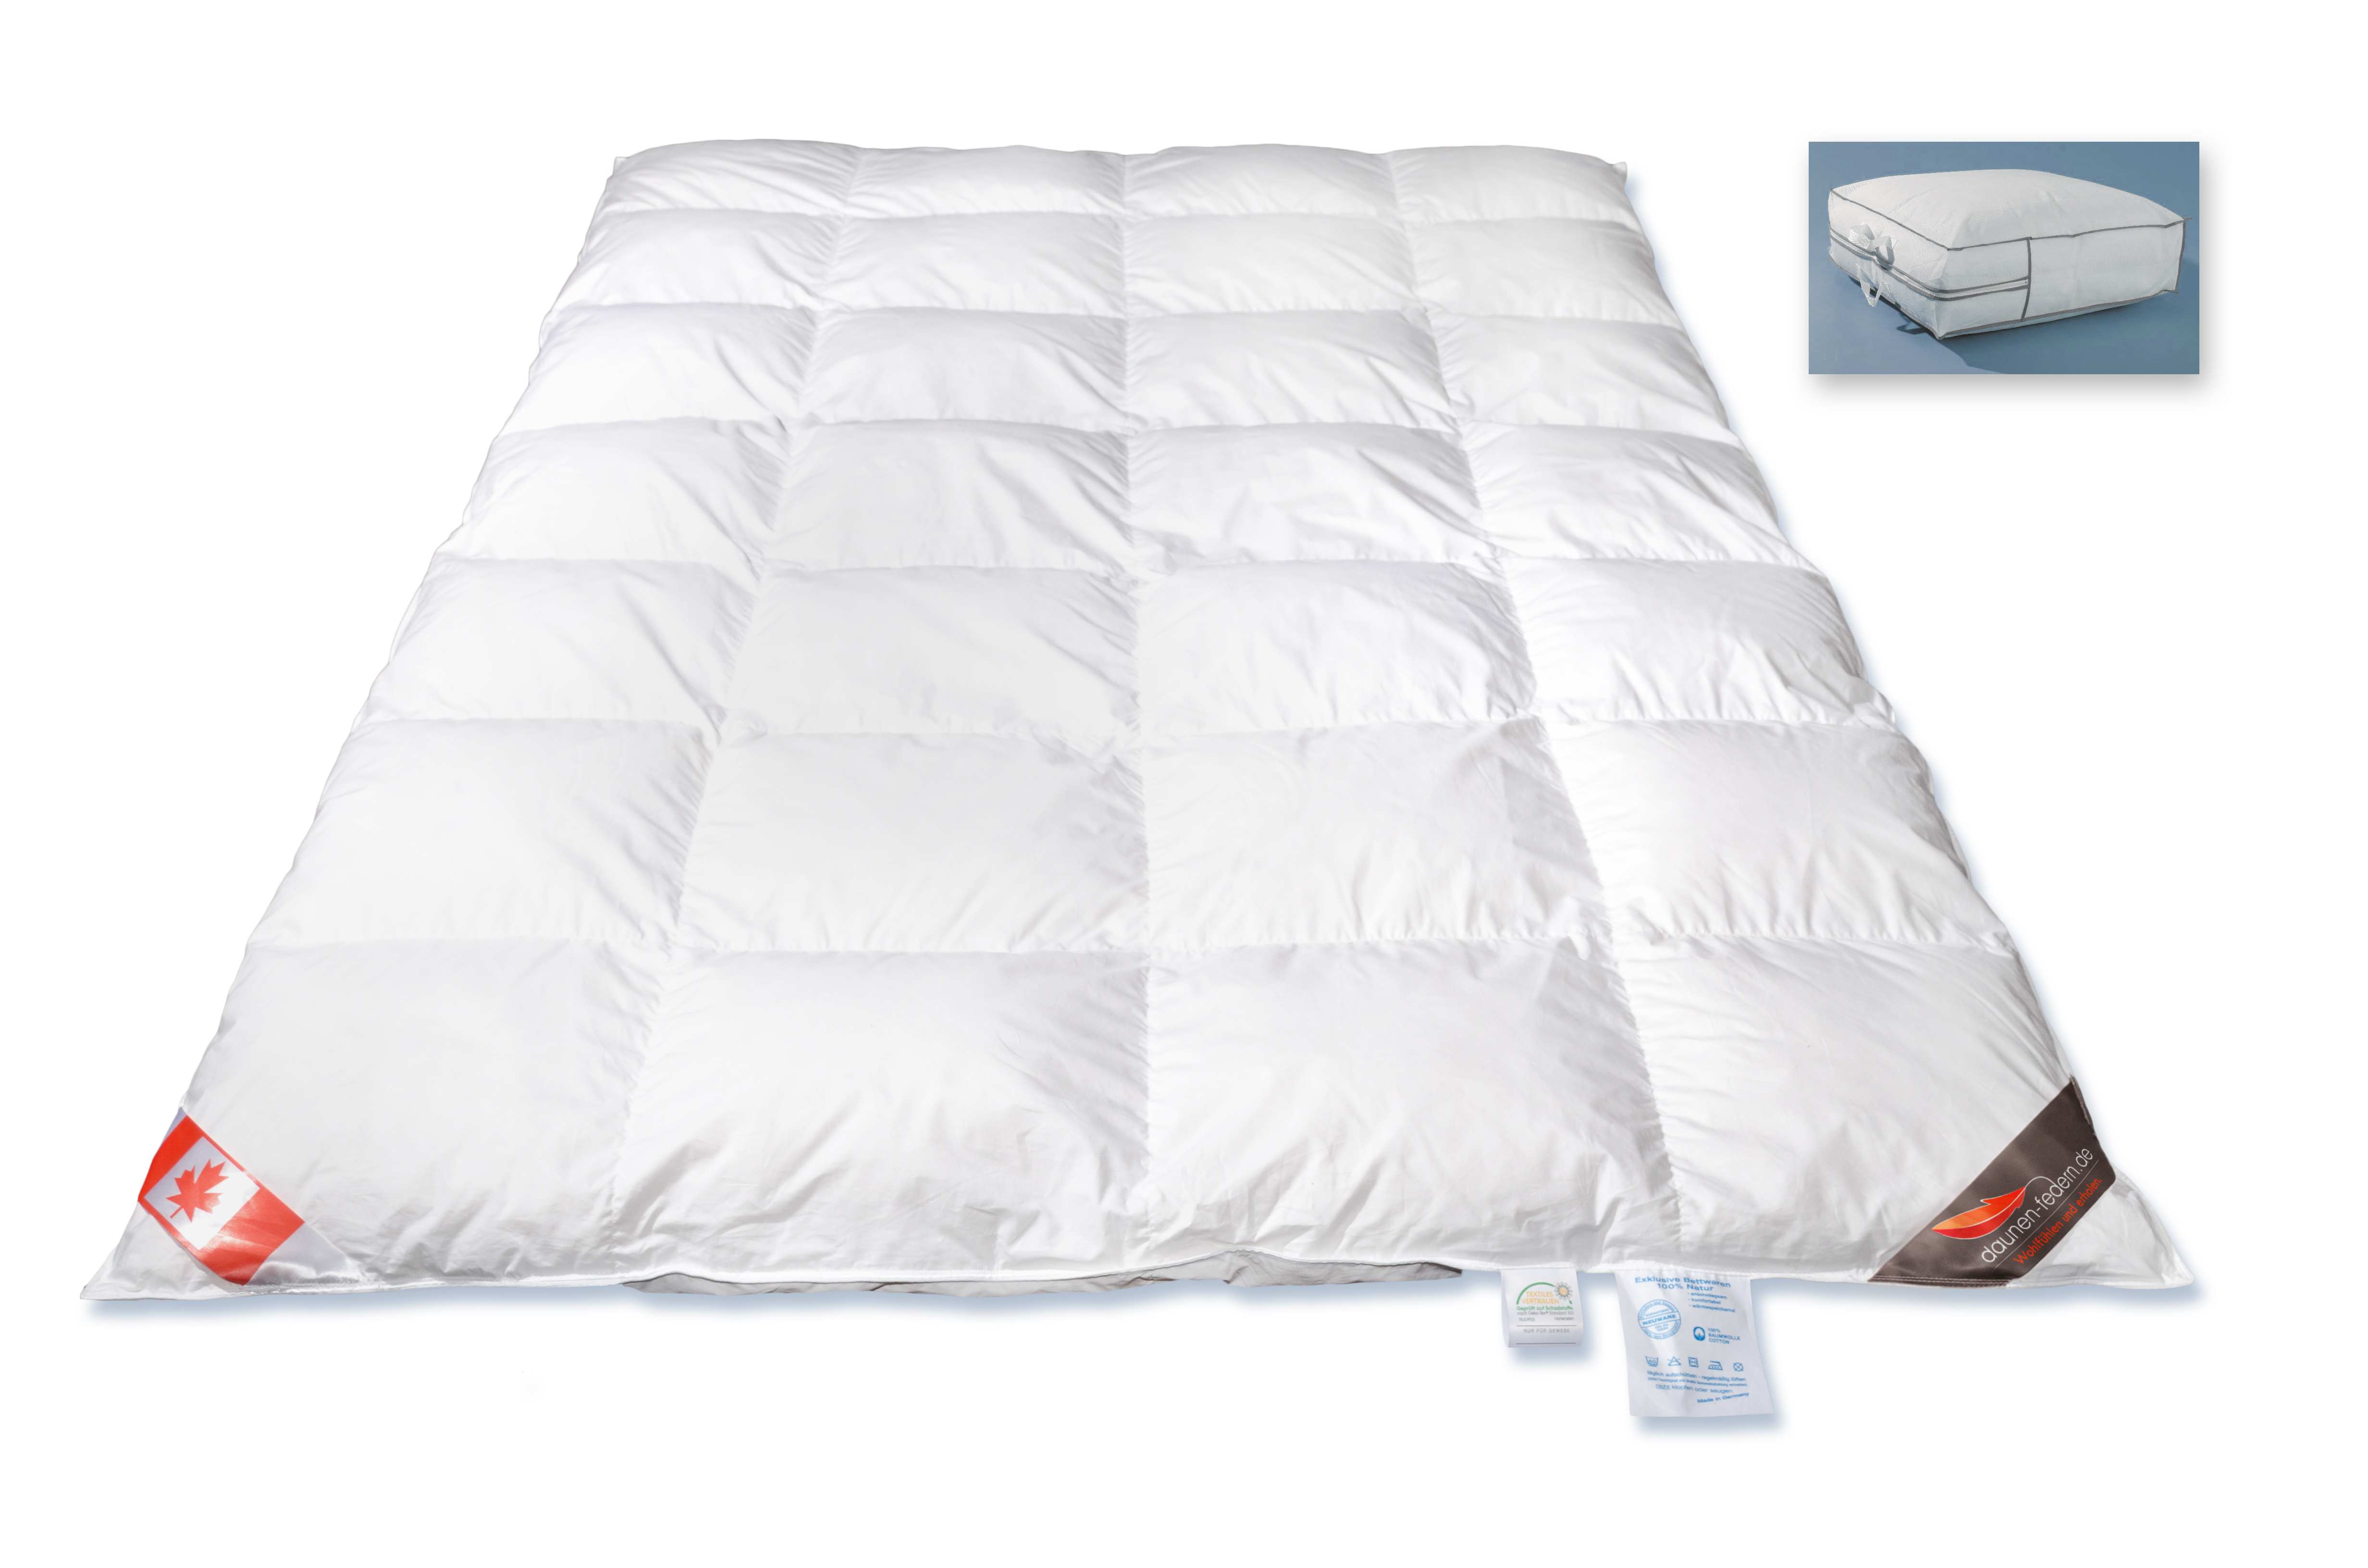 winter bettdecke 155x220 100 kanada g nsedaunen. Black Bedroom Furniture Sets. Home Design Ideas